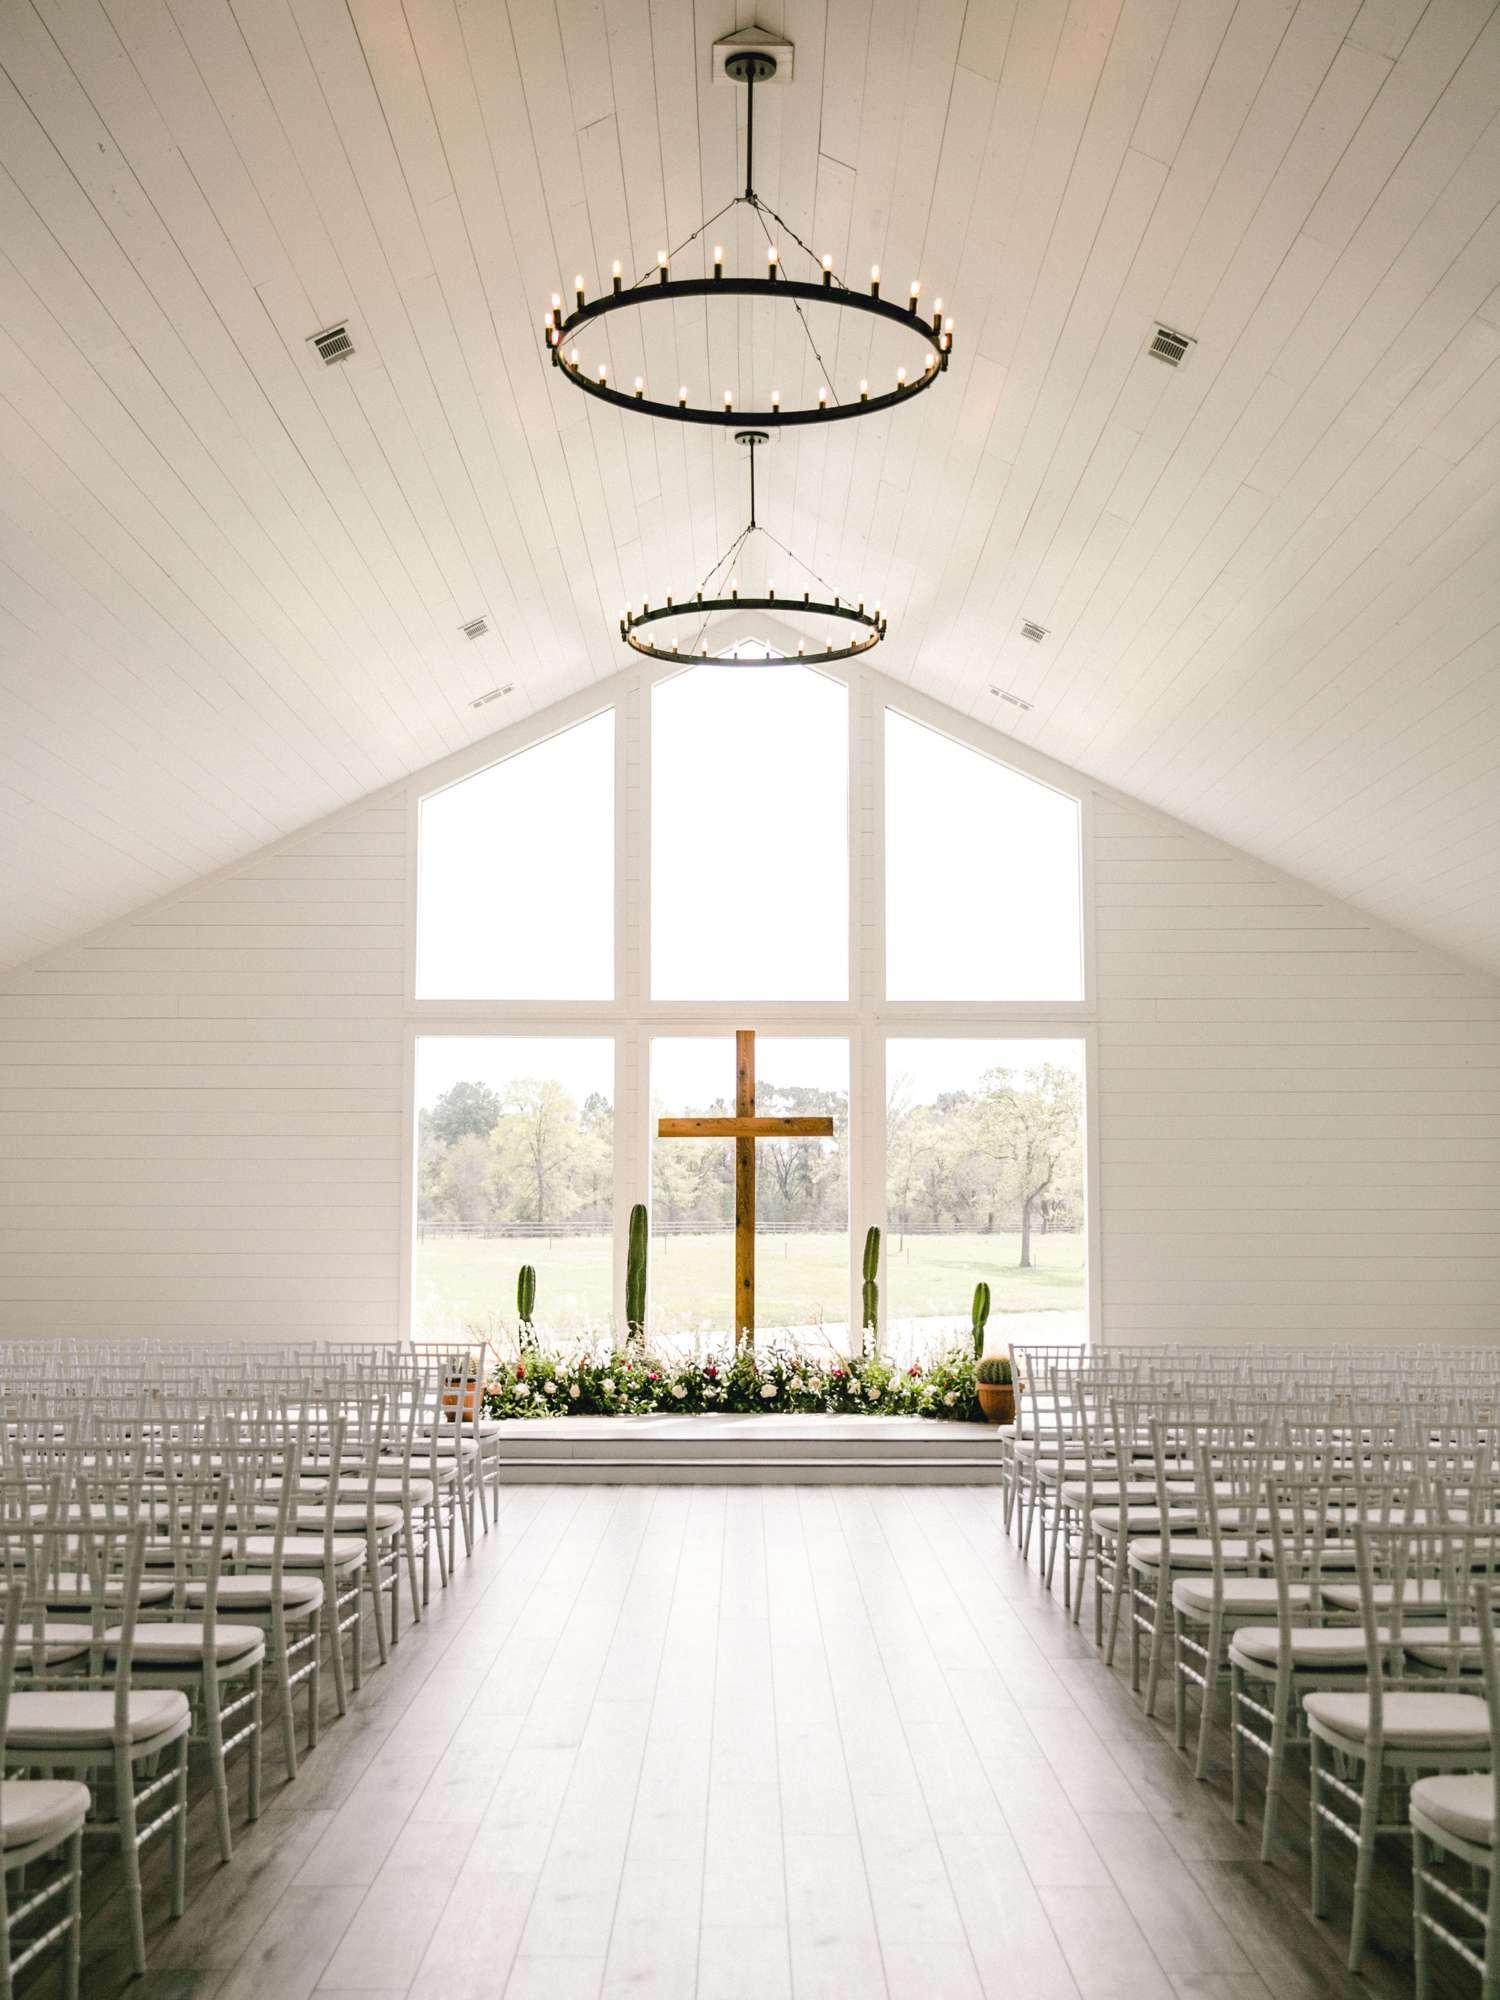 HEBERT_MORGAN_AND_CLAY_ALLEEJ_THE_FARMHOUSE_MONTGOMERY_TEXAS_WEDDING_0066.jpg